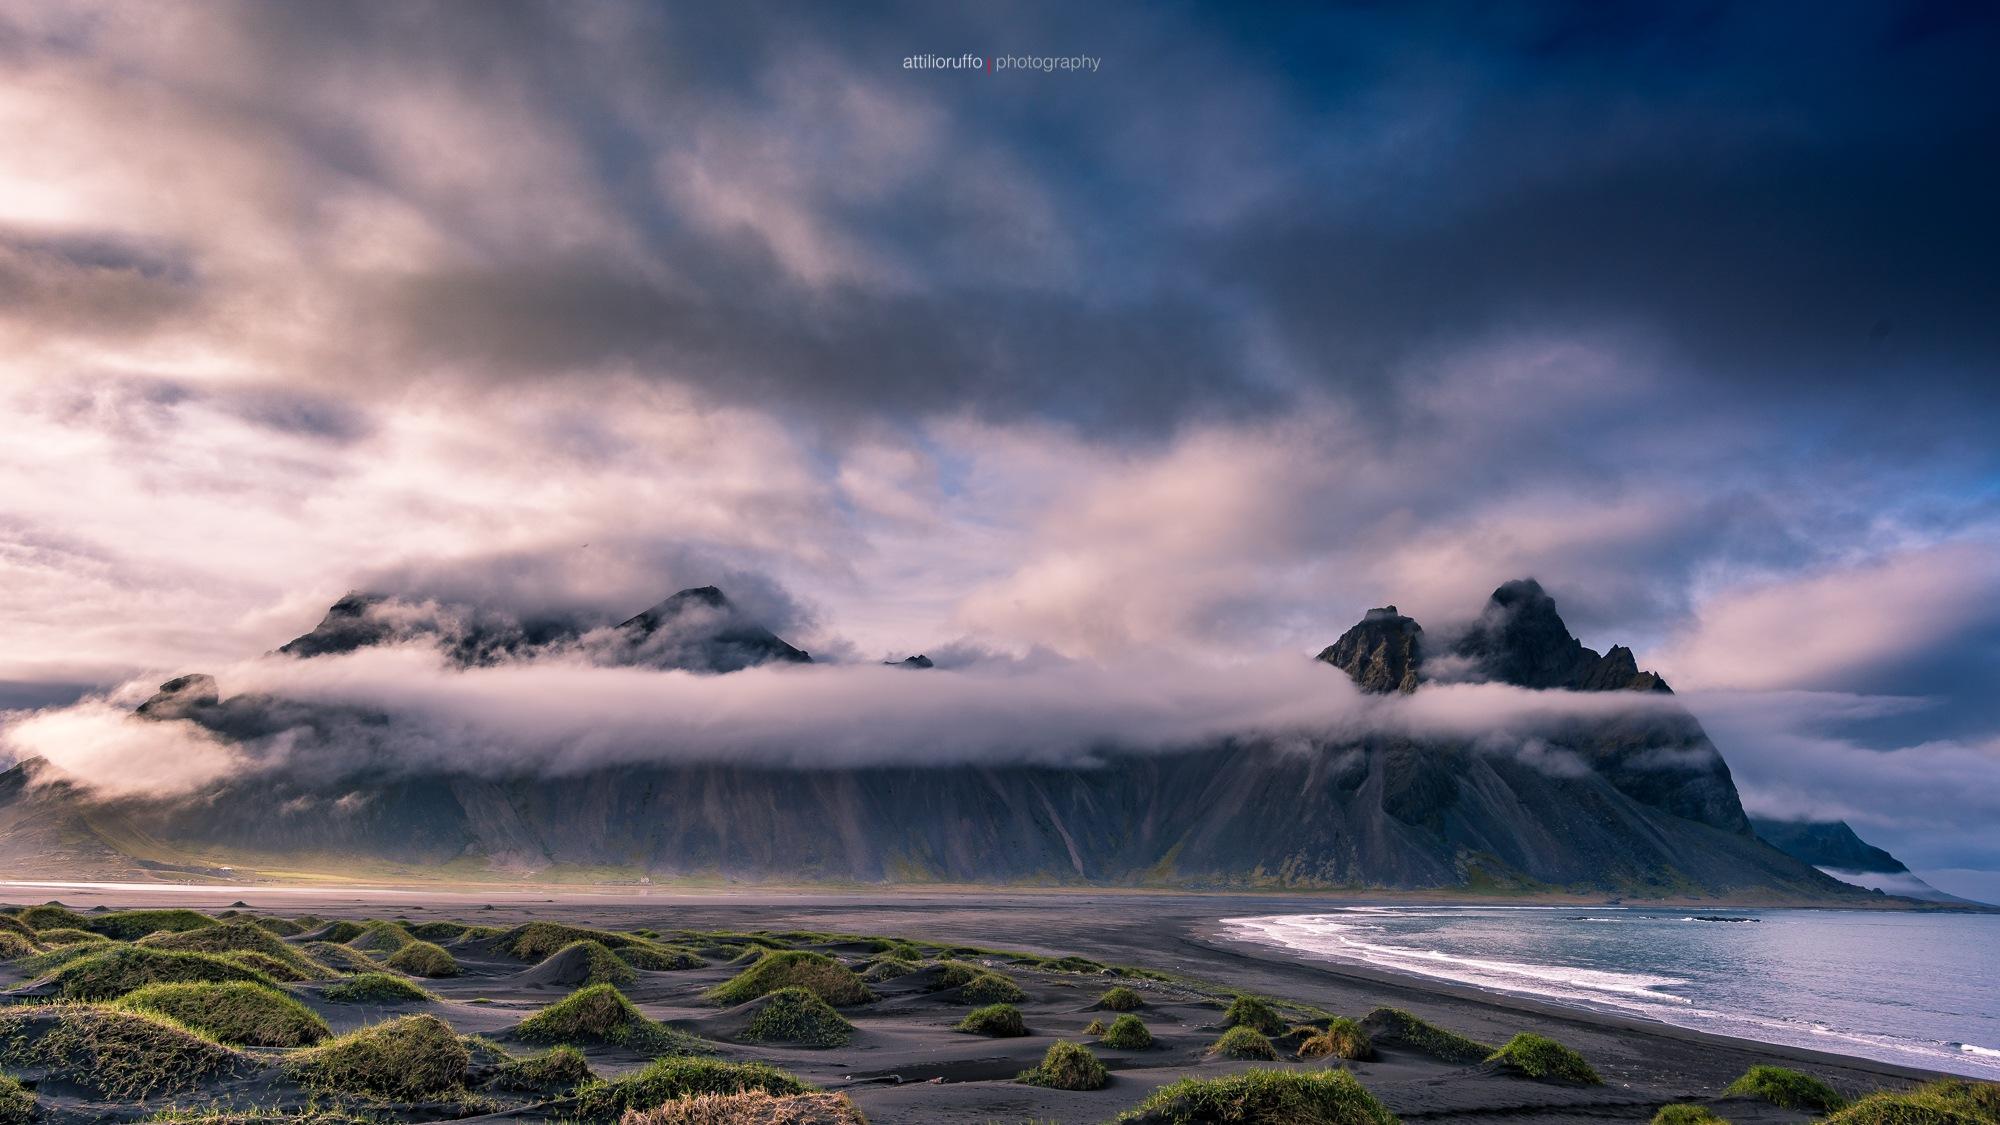 Vestrahorn_2441 by Attilio Ruffo Photography